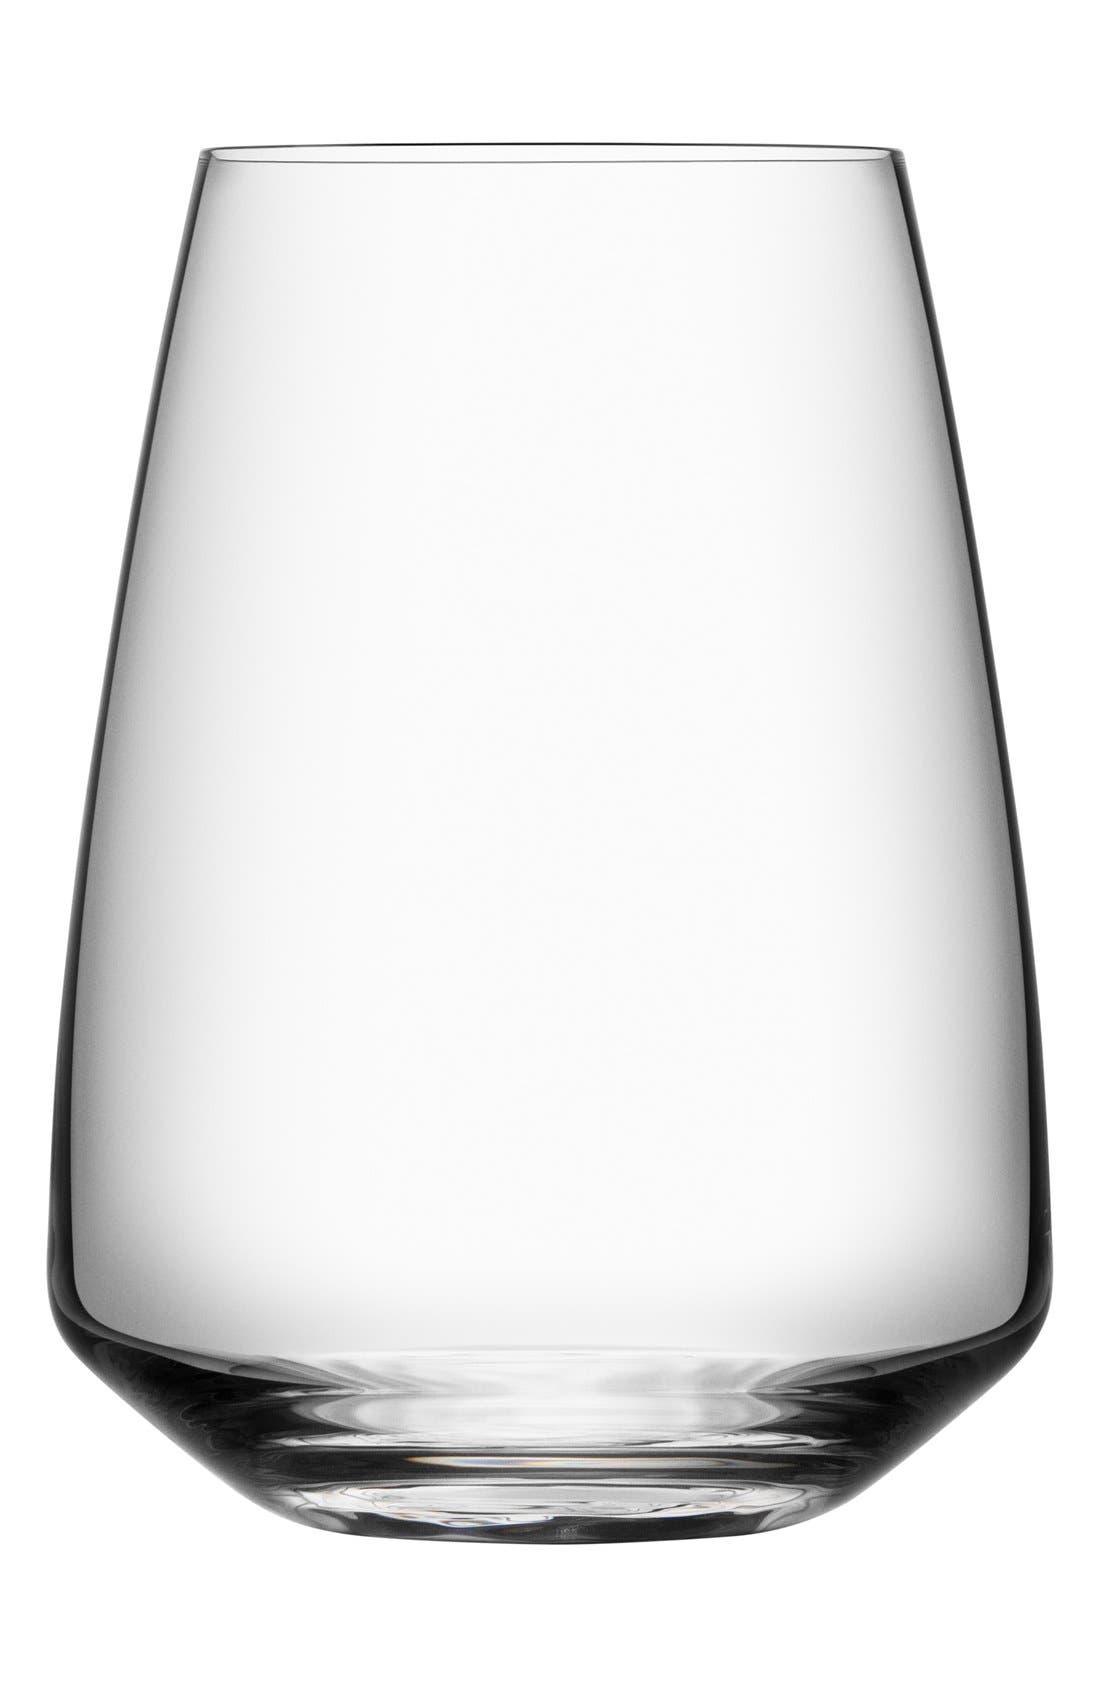 Orrefors Pulse Set of 4 Leaded Crystal Stemless Wine Glasses